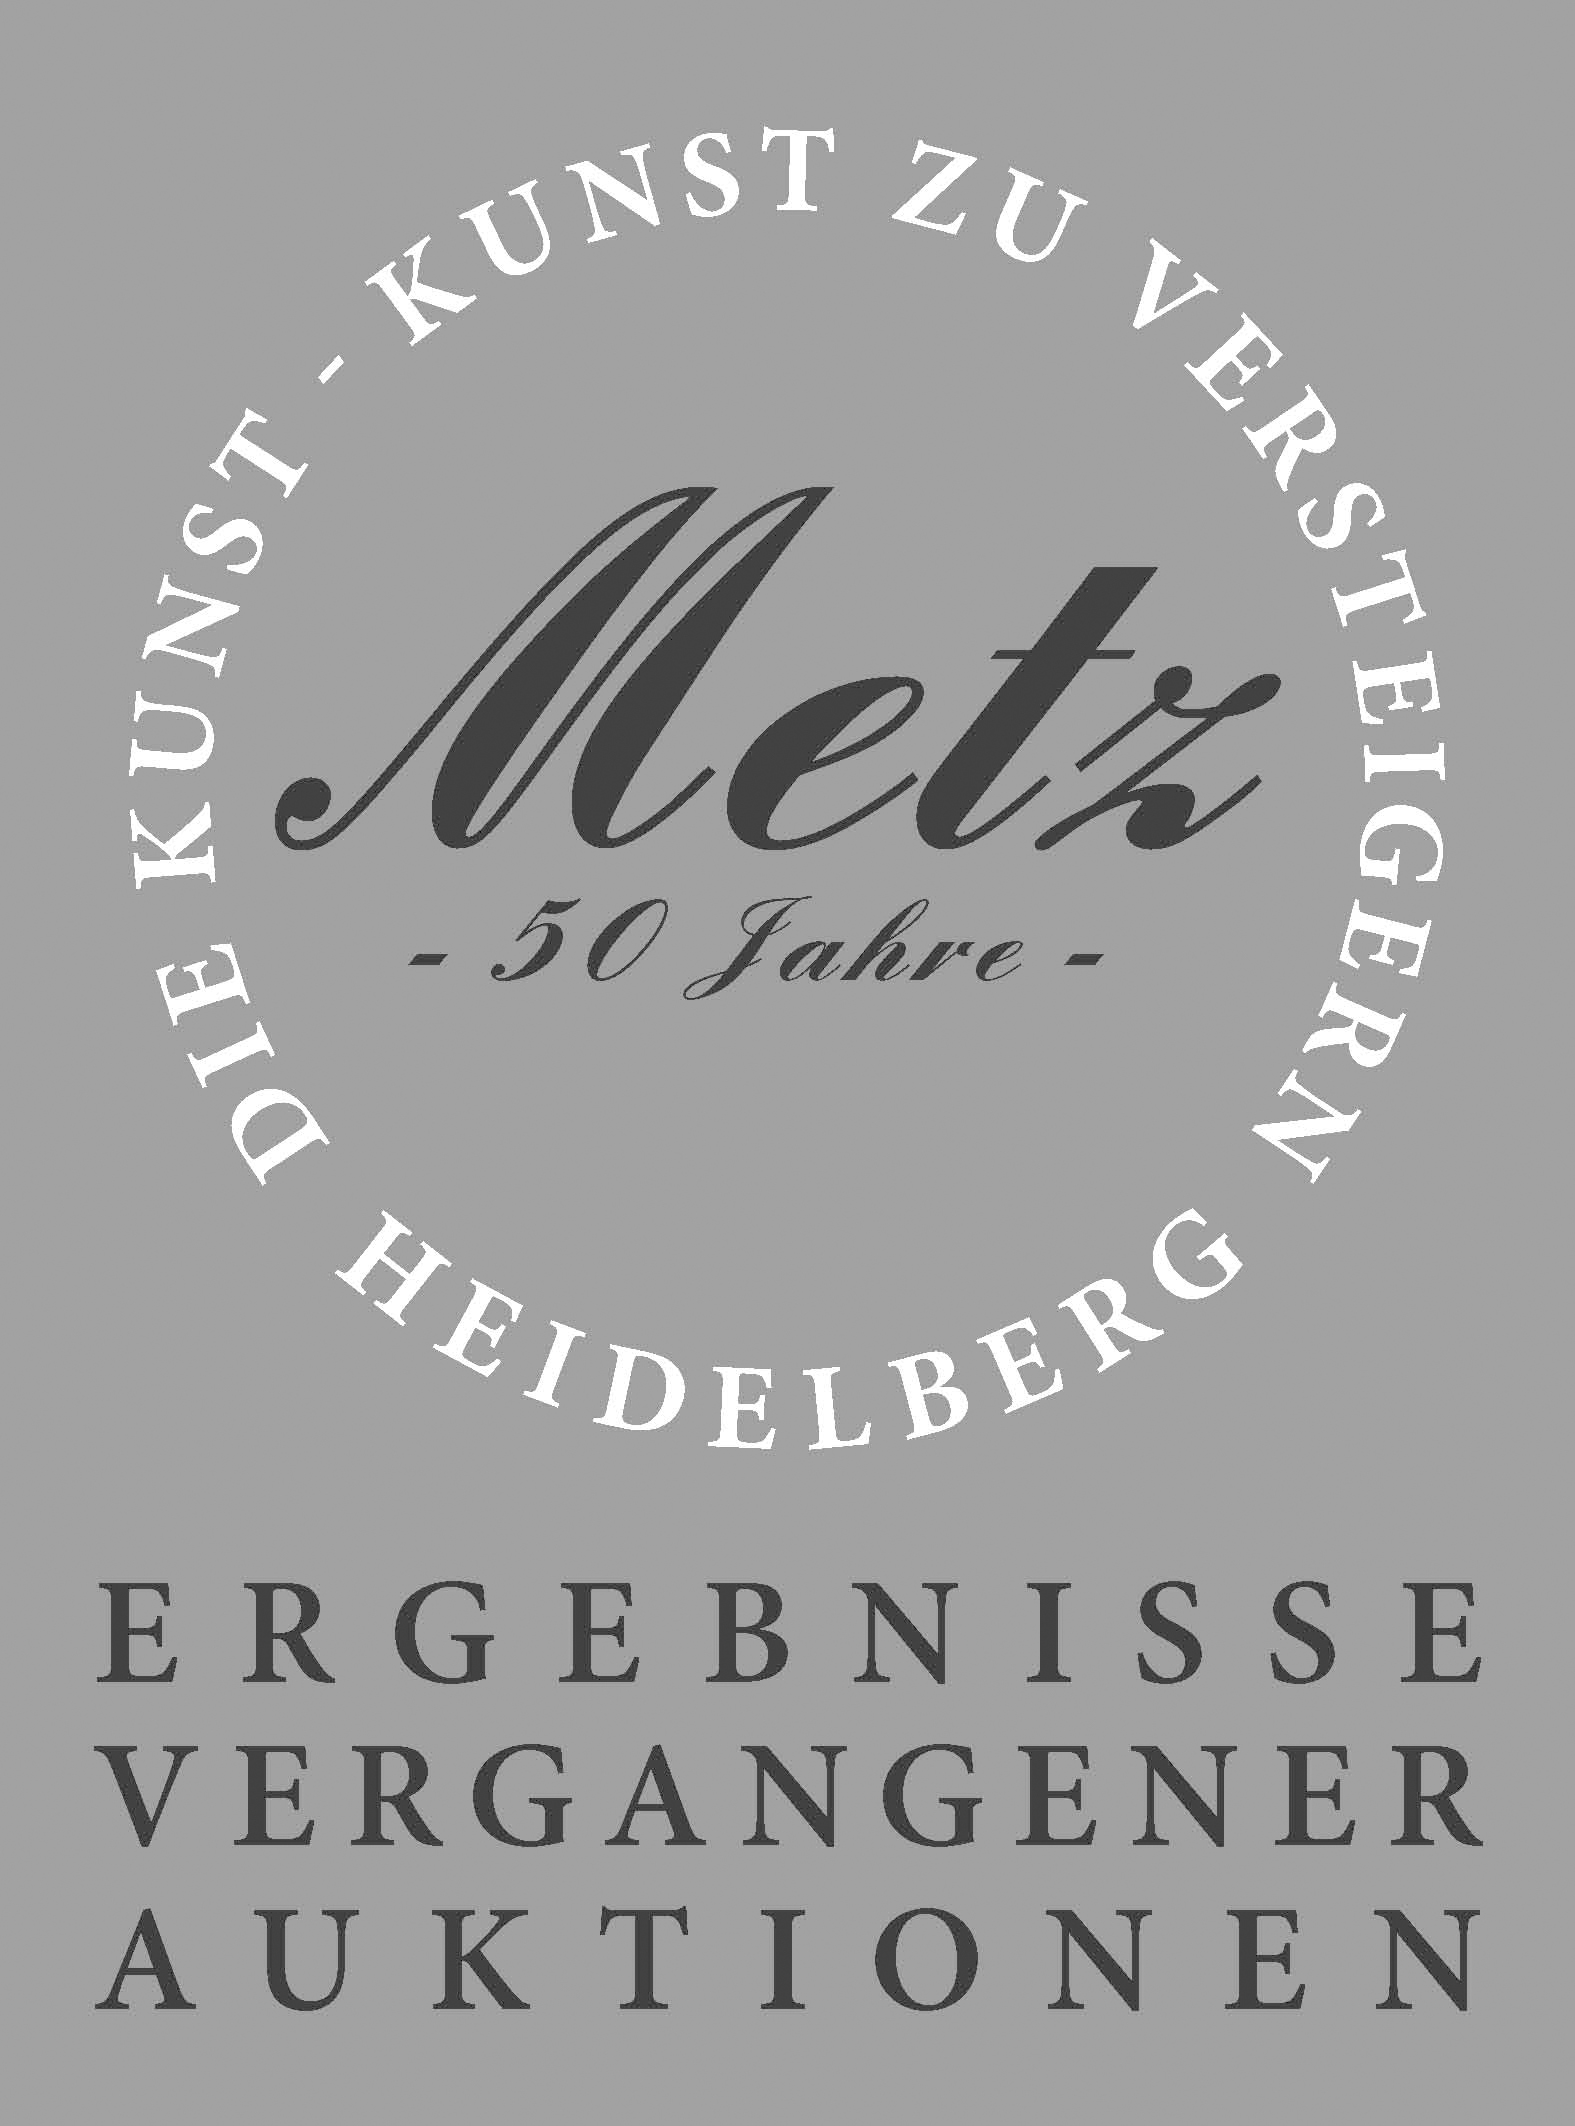 06221 23571 fax 183231 e mail fine art metz auctions com www metz auktion de metz auktionshaus